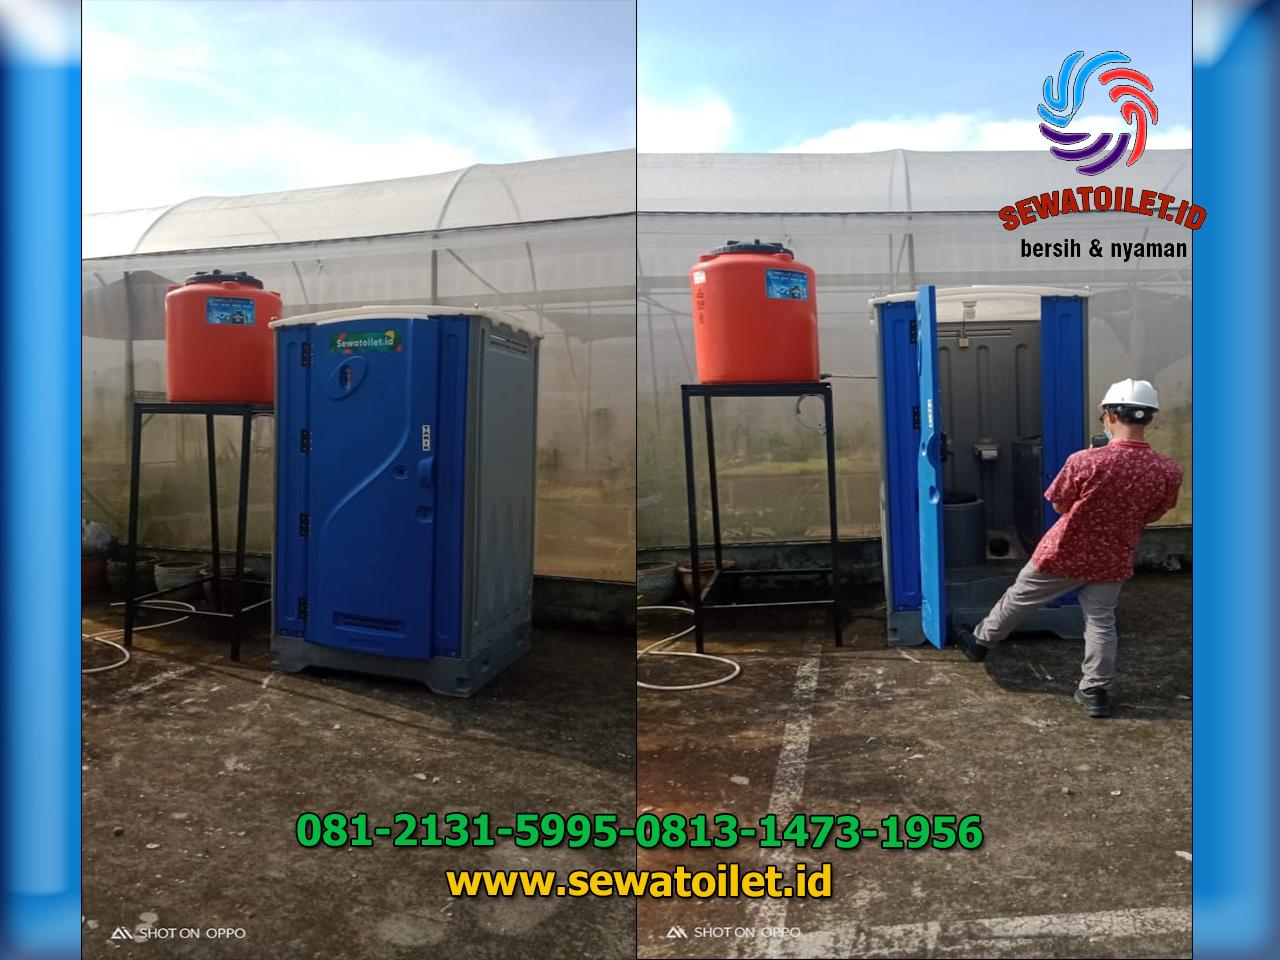 Sewa Toilet Portable Acara PT.East West Seed Indonesia Purwakarta